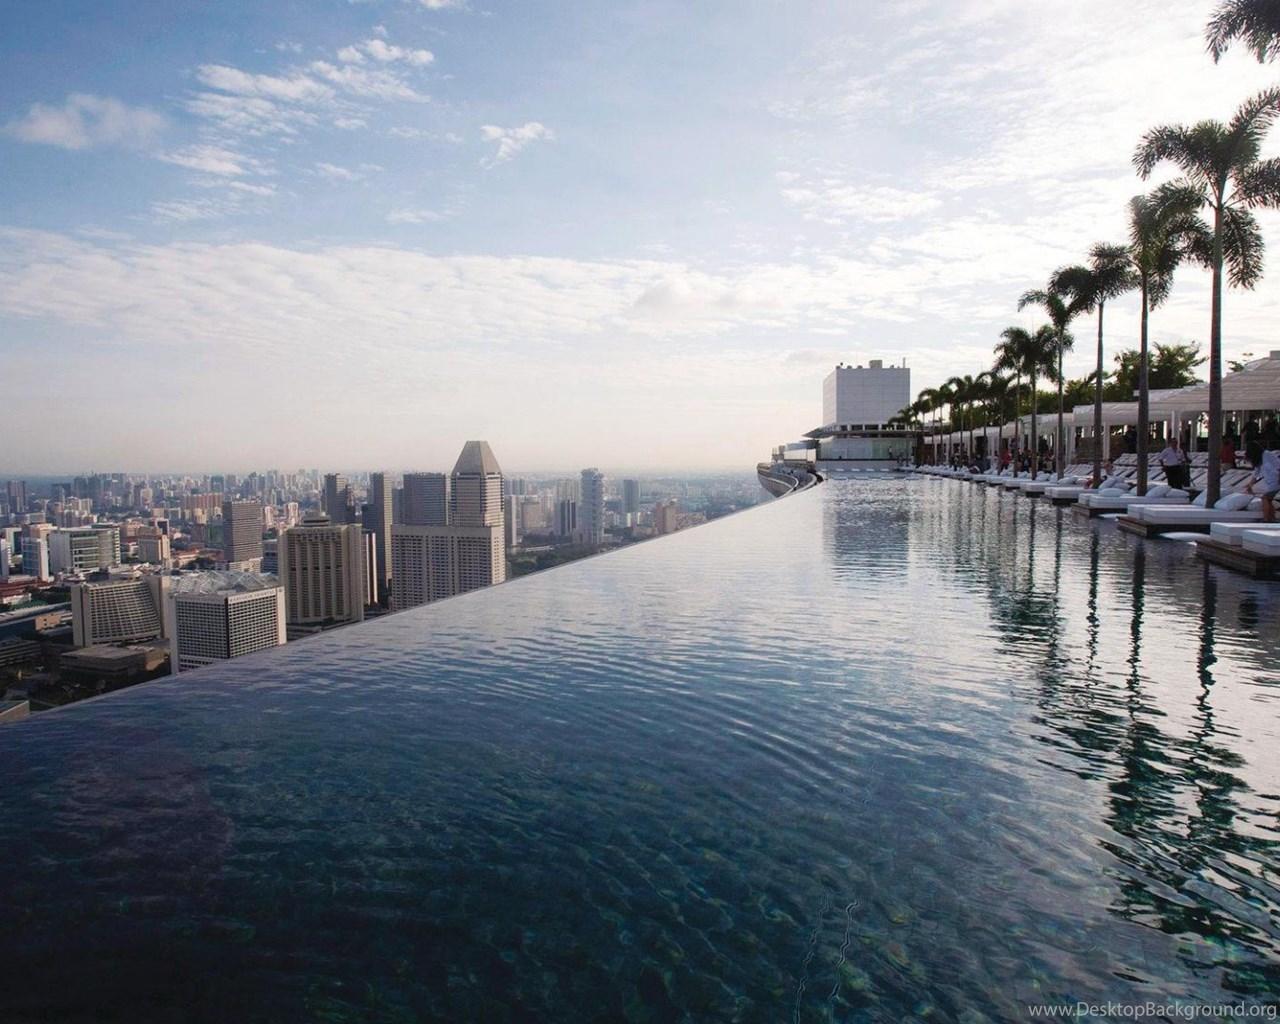 Marina Bay Sands, Hotel, Singapore 1920x1080 (1080p